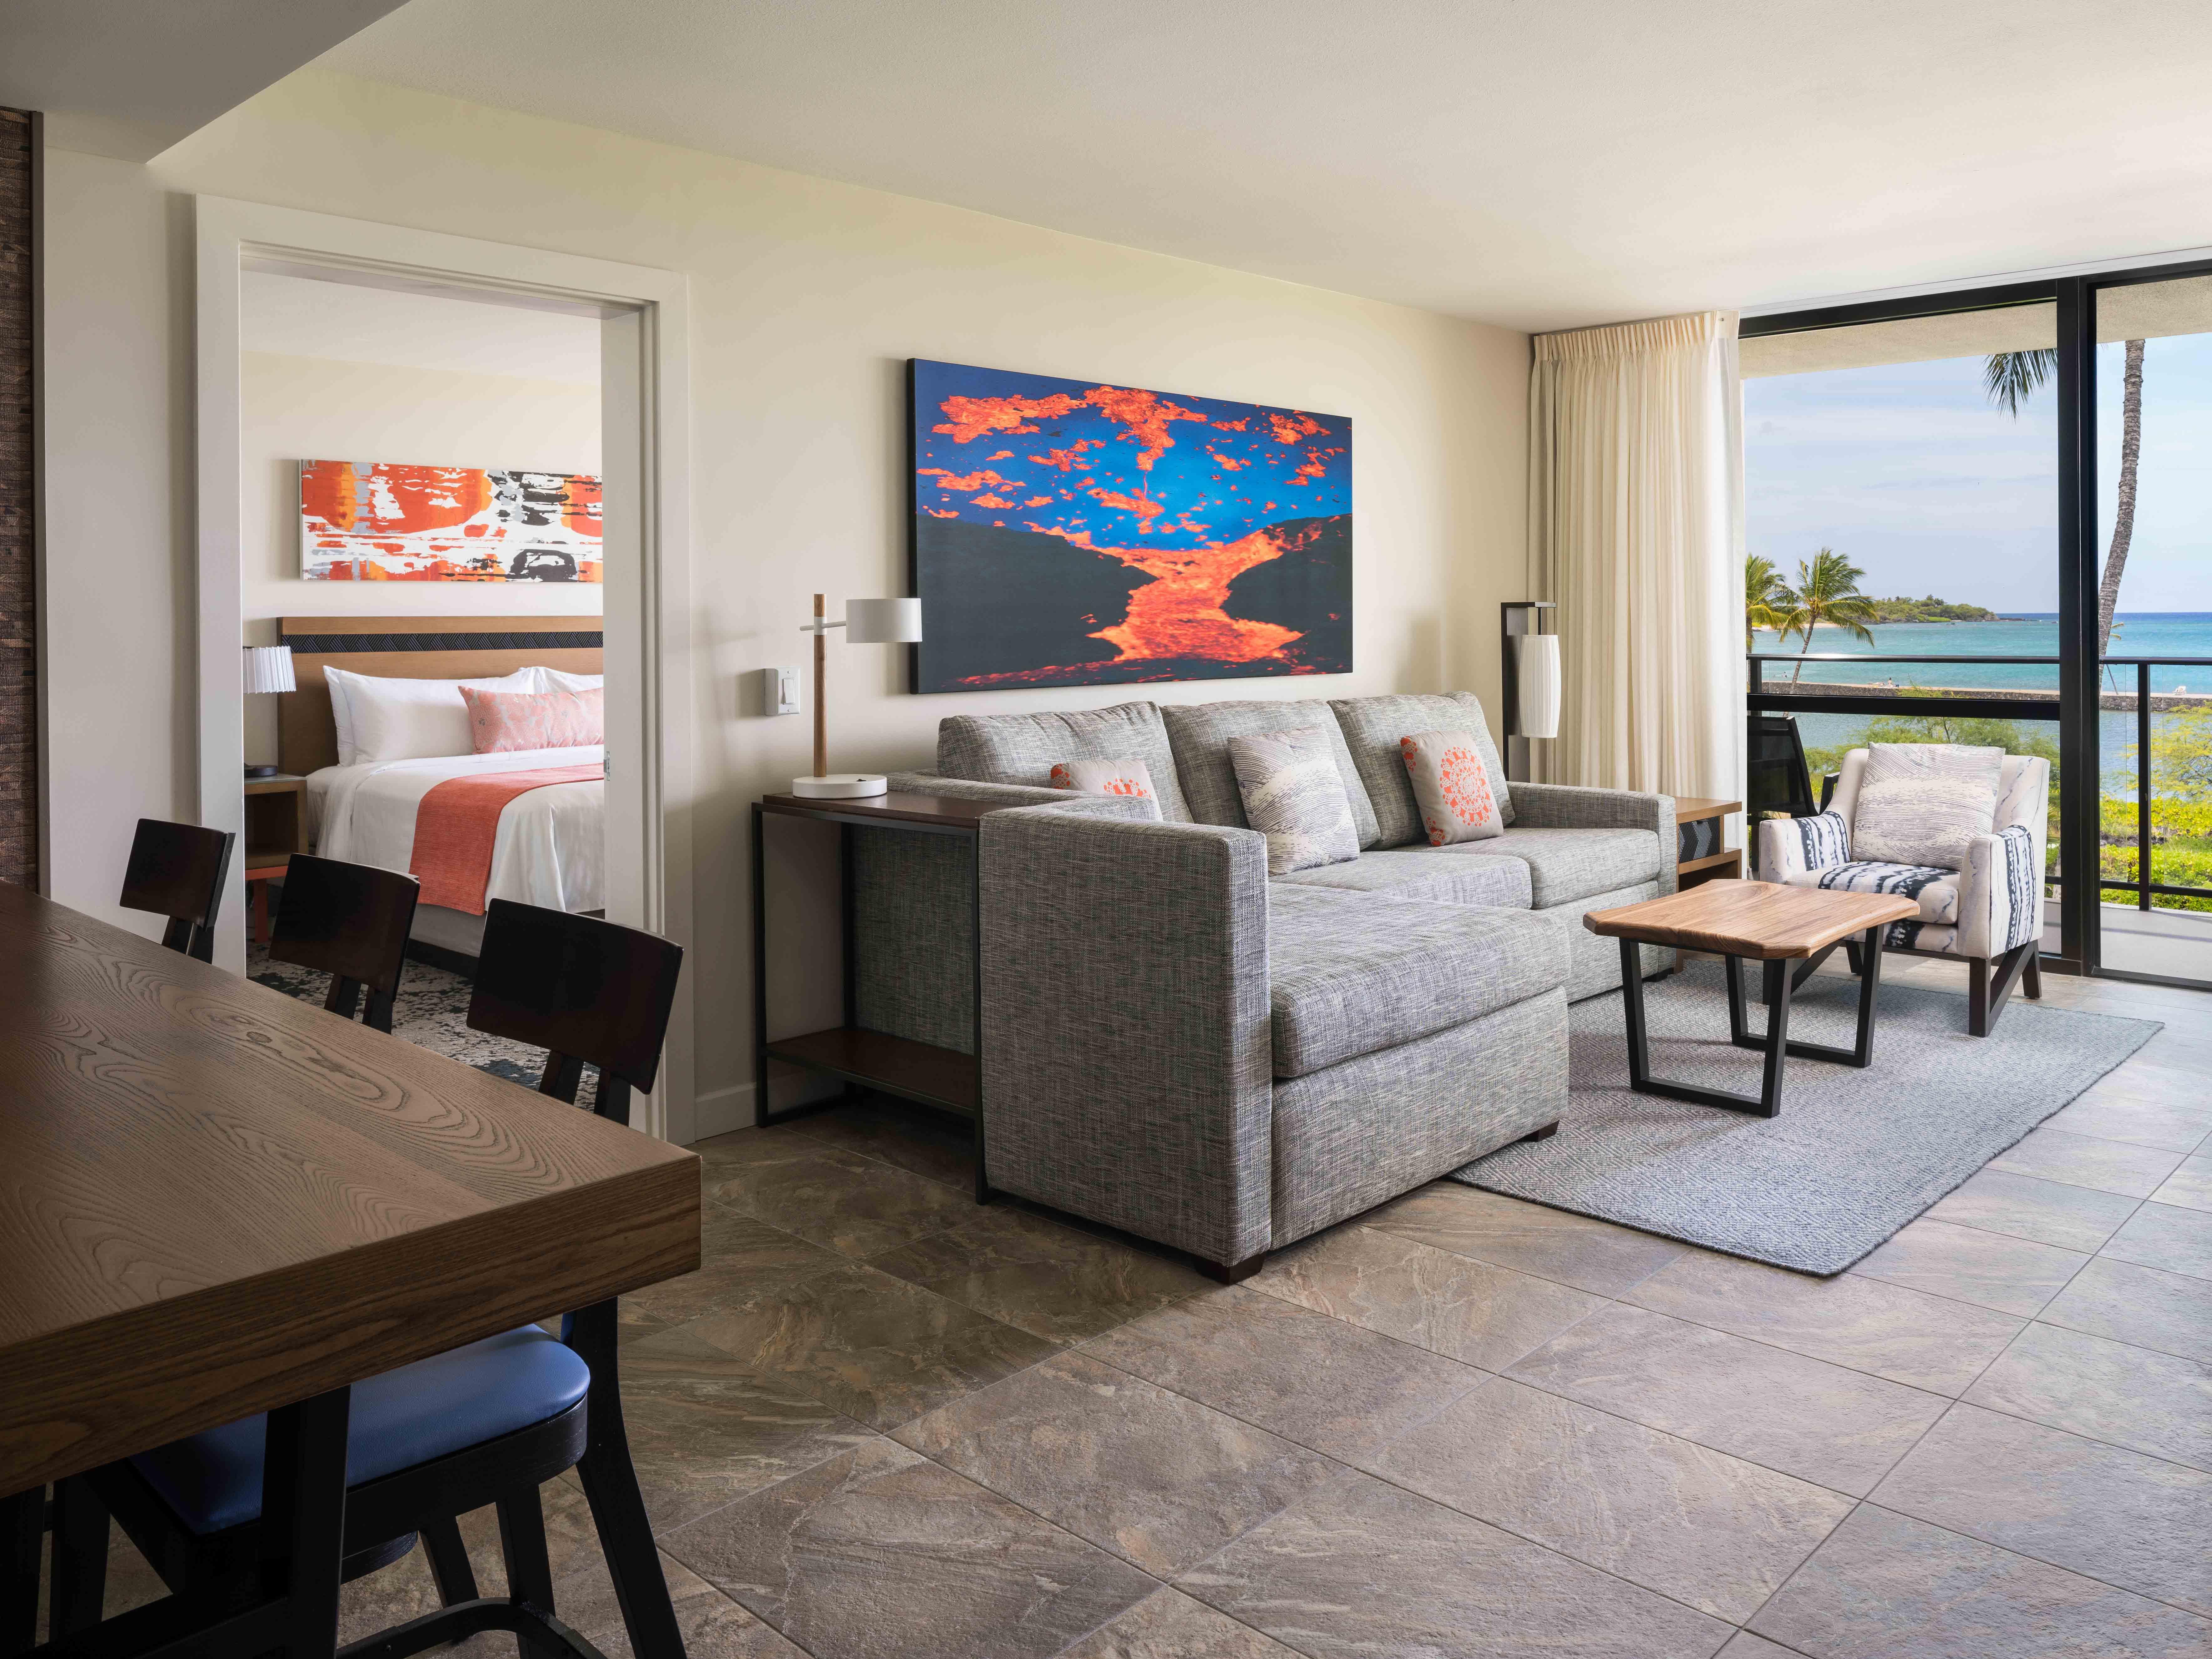 Marriott's Waikoloa Ocean Club Villa Living Room . Marriott's Waikoloa Ocean Club is located in Waikoloa Beach, Big Island, Hawai'i United States.